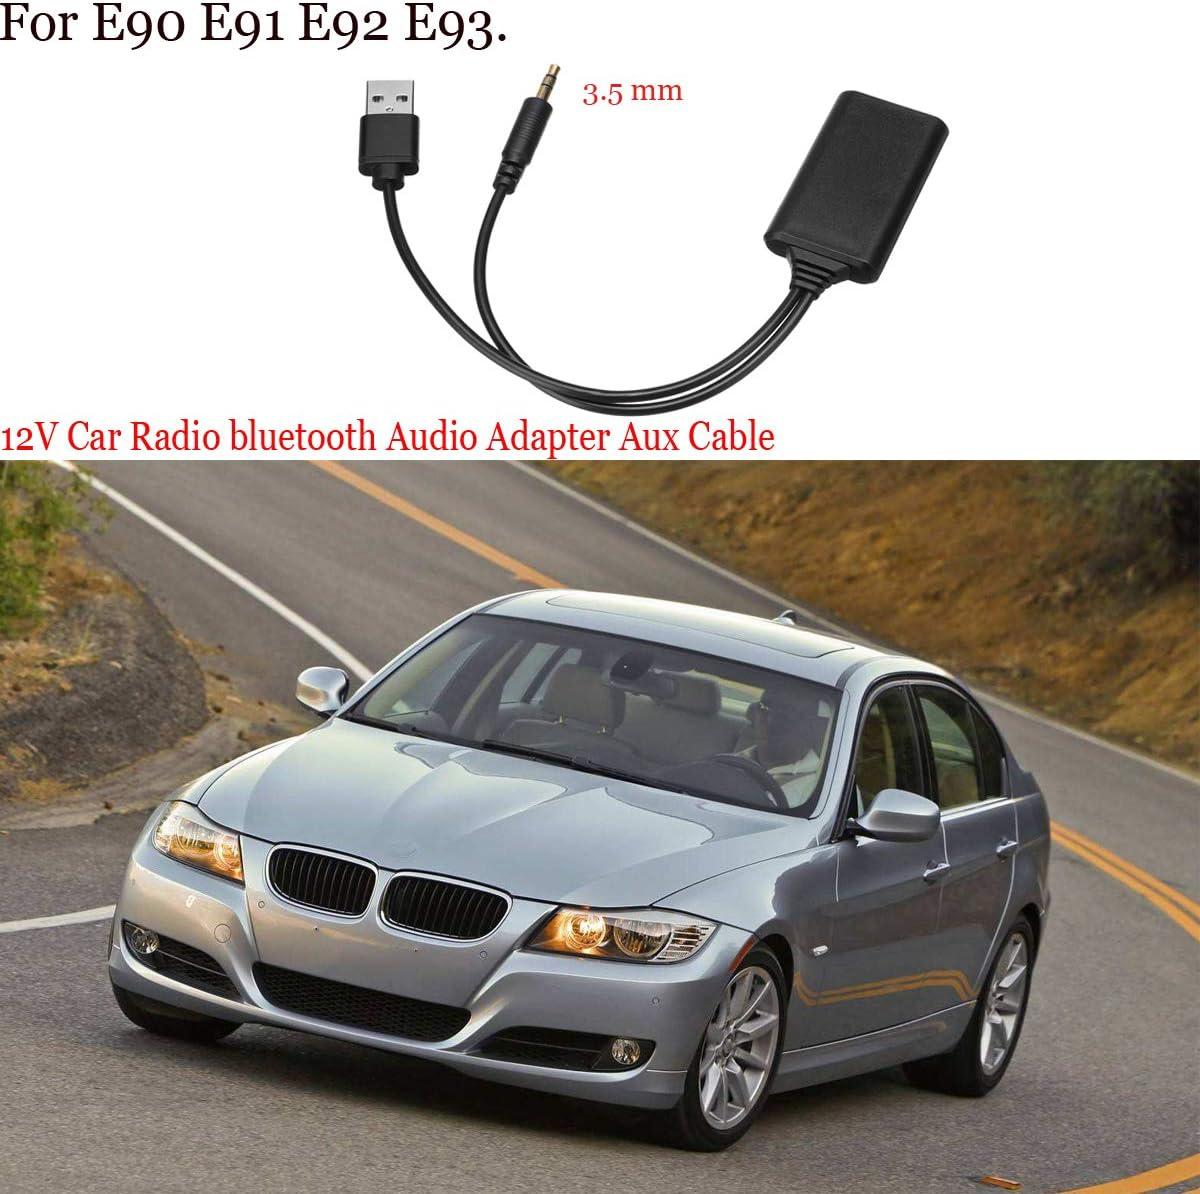 Macabolo Adaptateur Audio Bluetooth Portable 12 V pour E90 E91 E92